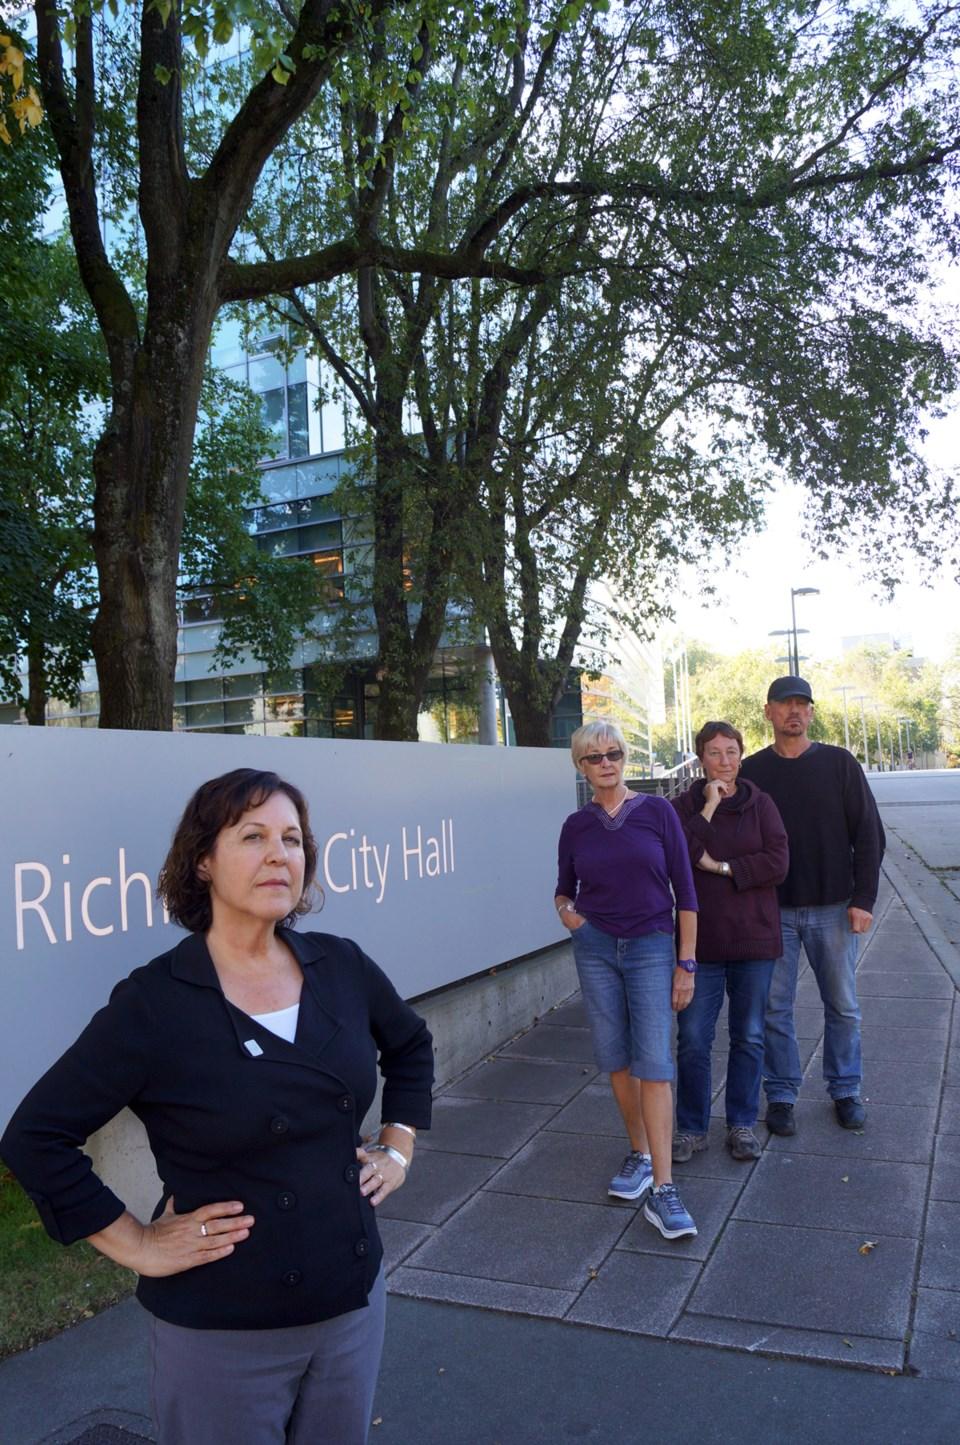 Richmond's social service agencies send S.O.S to city hall_2